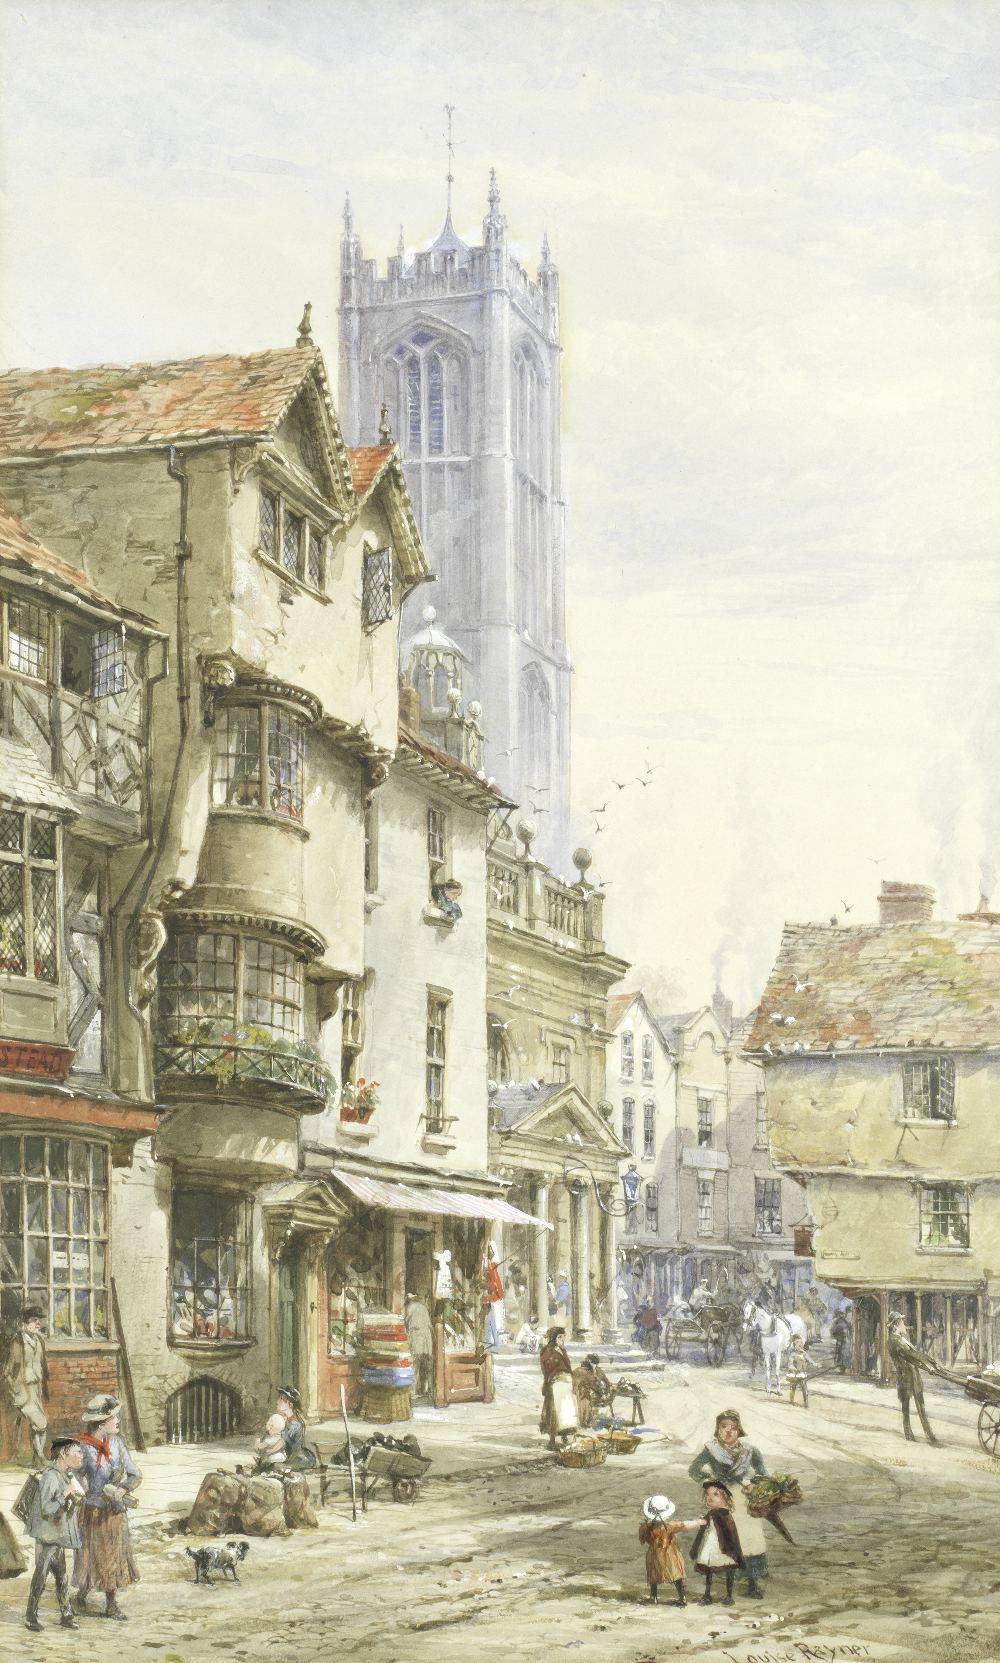 Lot 2 - Louise J. Rayner (British, 1832-1924) Ludlow, Shropshire